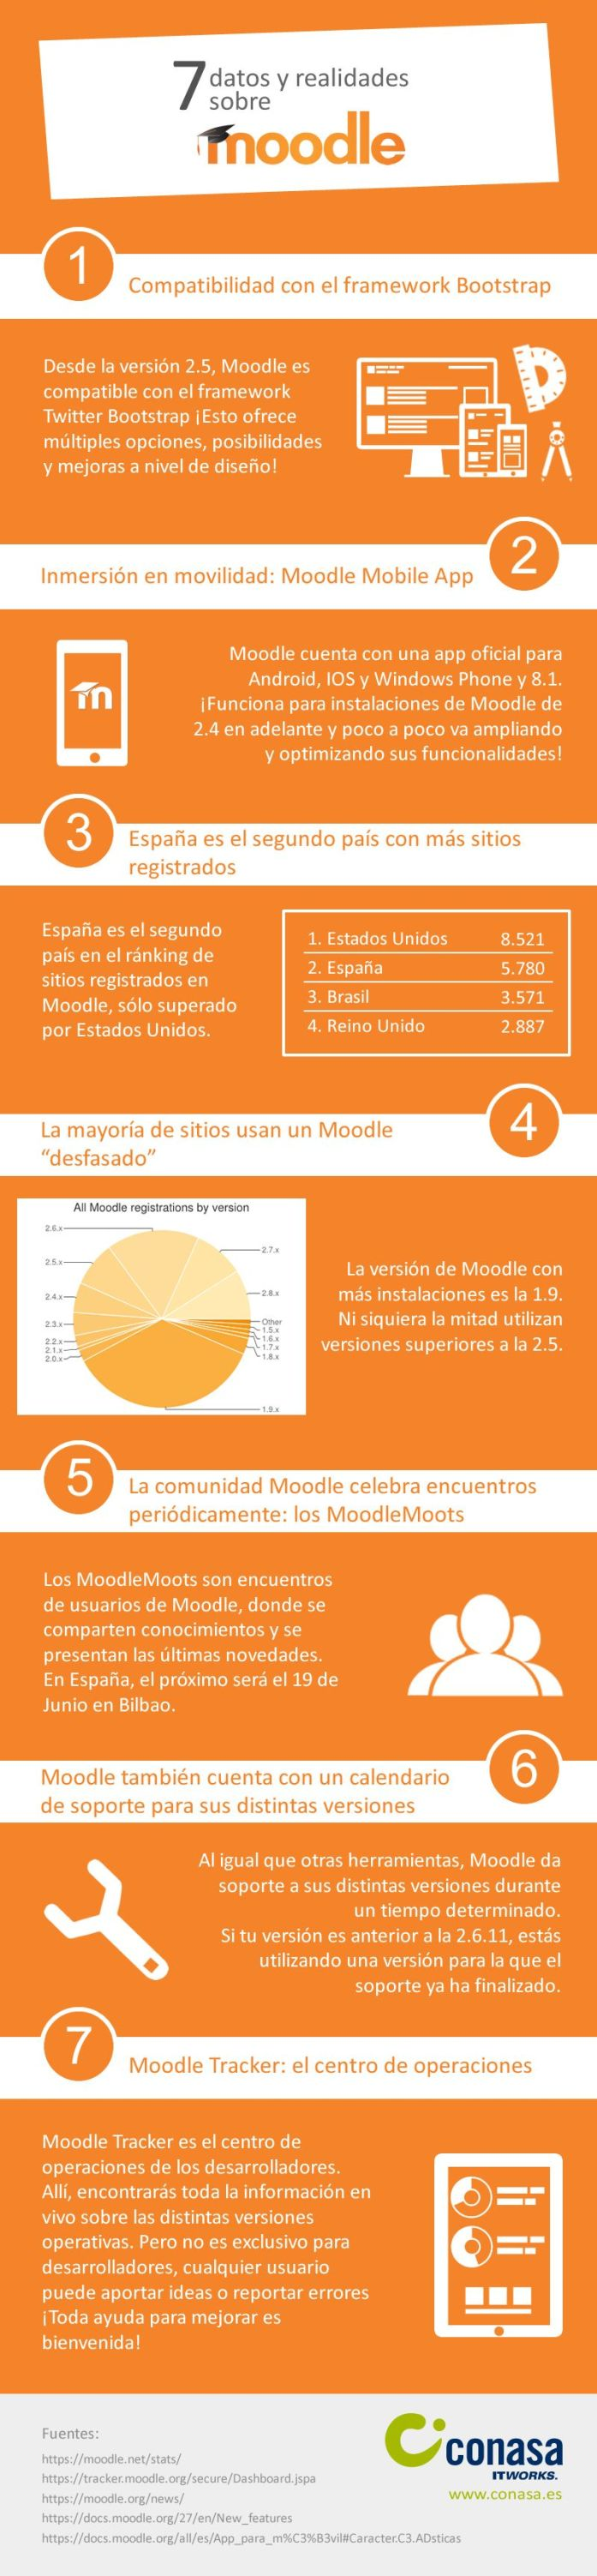 Moodle7DatosRealidades-Infografia-BlogGesvin